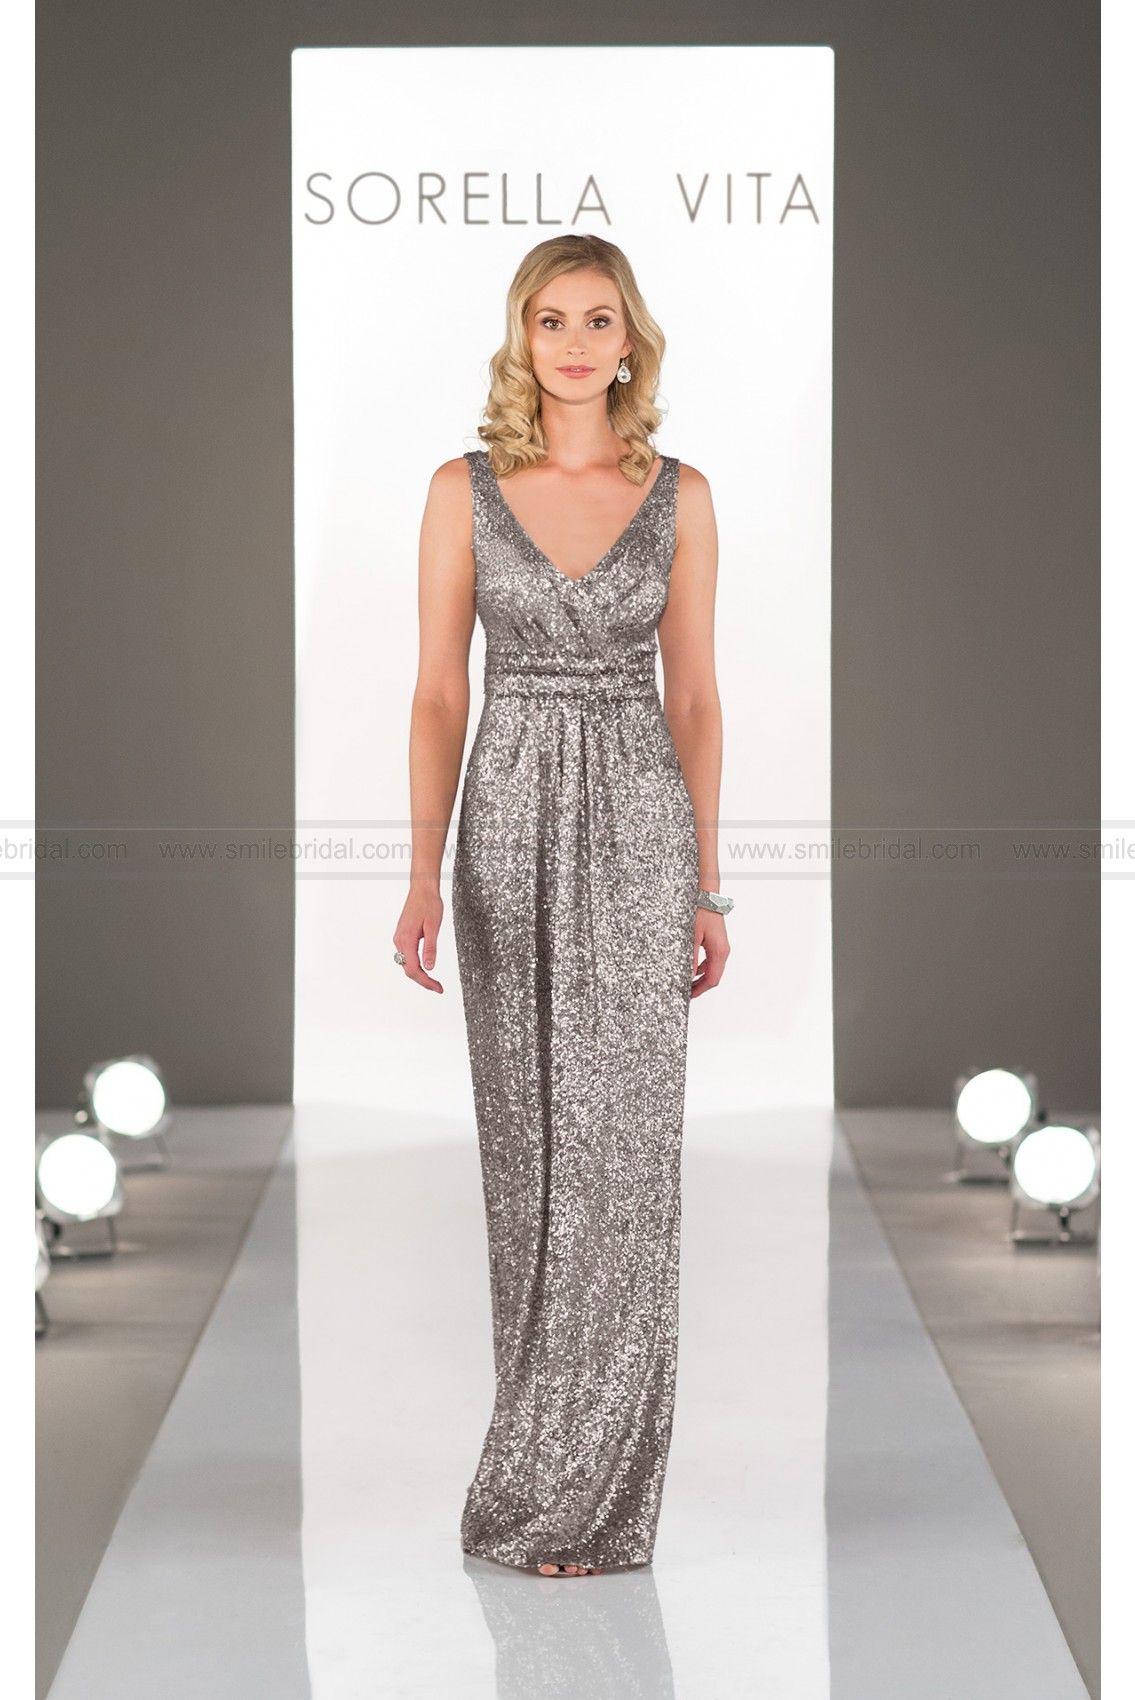 236959b0db4 Sorella Vita Platinum Bridesmaid Dress Style 8686 (Include Crown ...